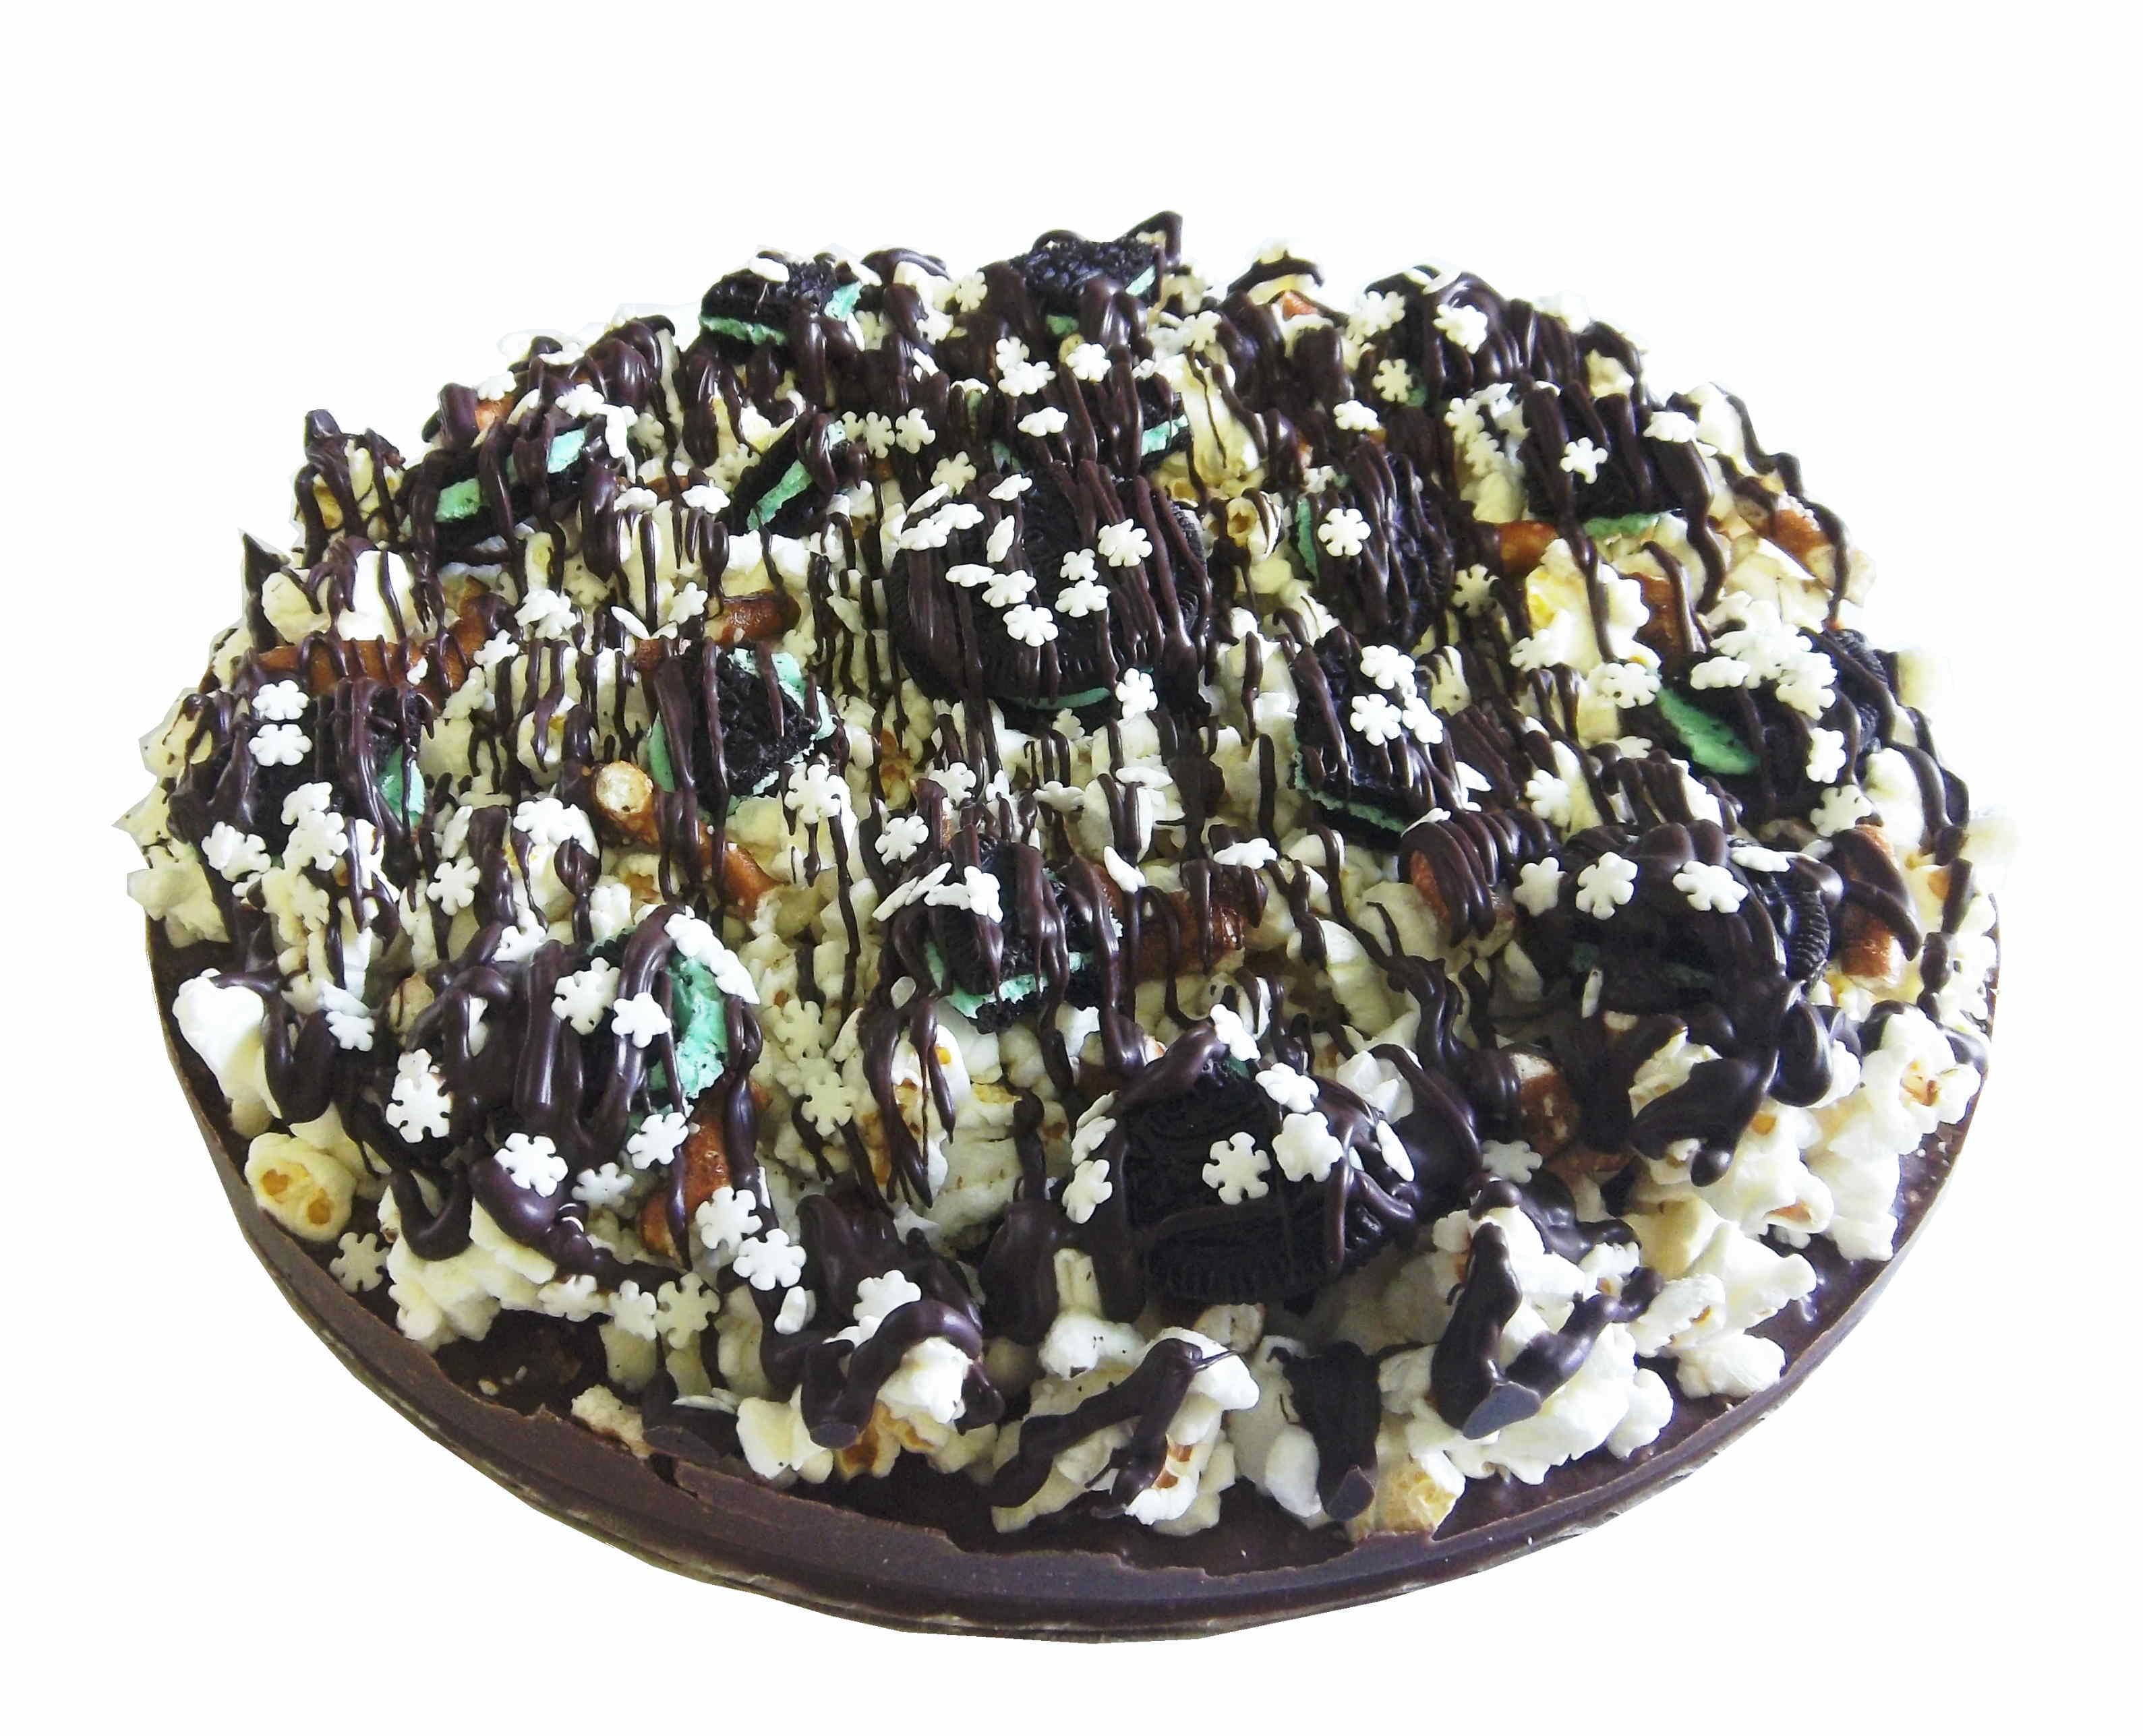 Gourmet Chocolate Pizza - Pizazz™ - Mini - Supreme - Dark Mint Chocolate - Wholesale W-MISUDM